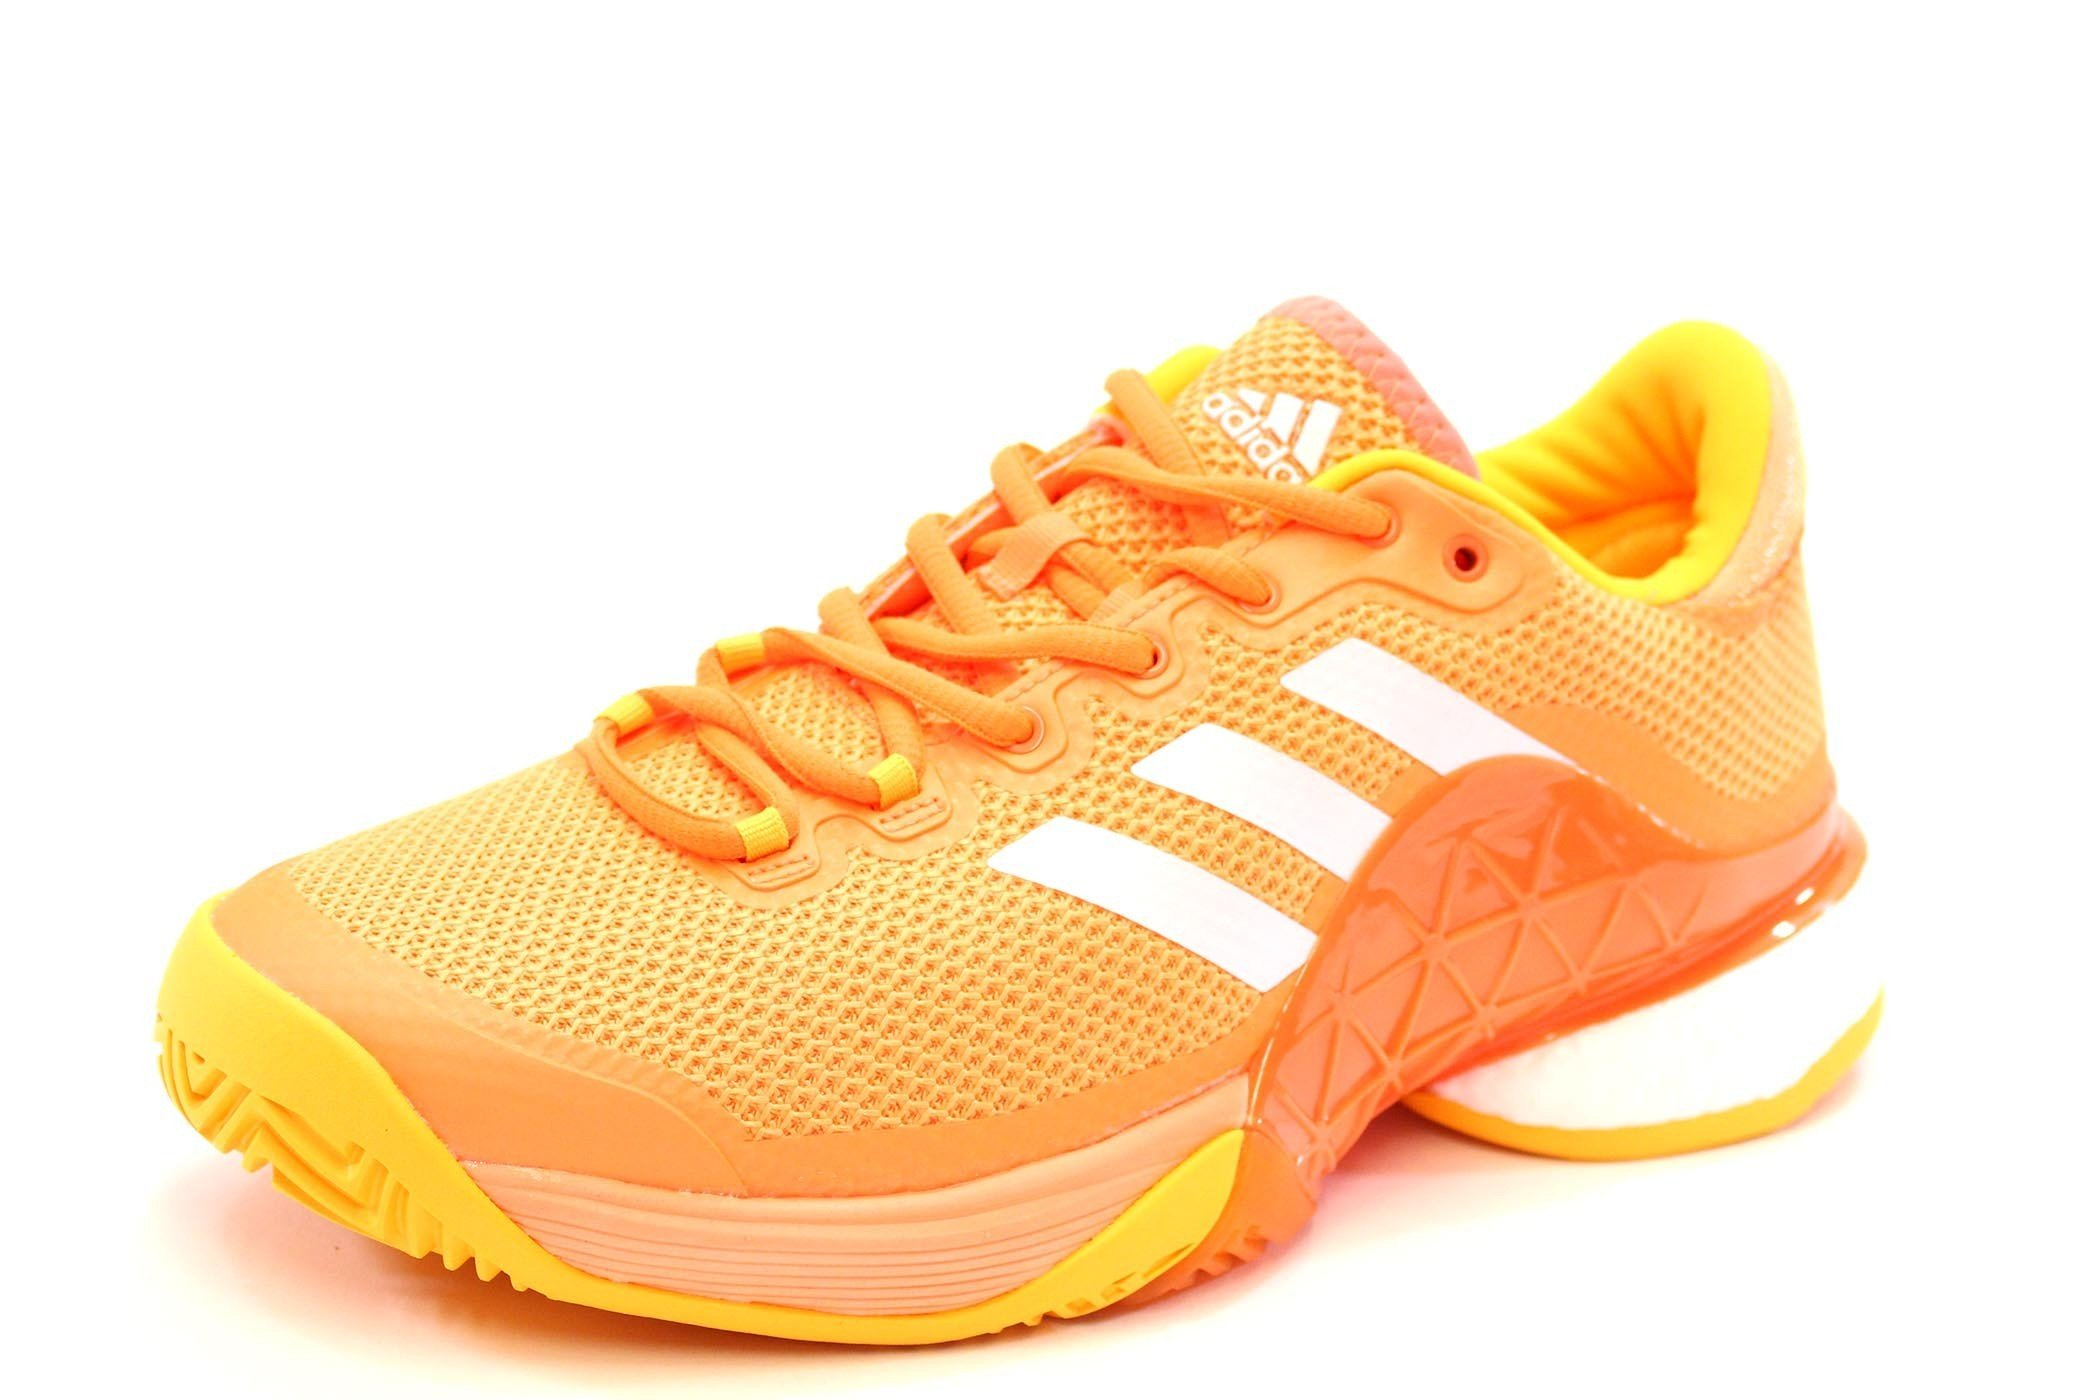 027af32f1 Galleon - Adidas Men s Barricade 2017 Boost Men s Tennis Shoe Glow Orange Footwear  White Solar Gold